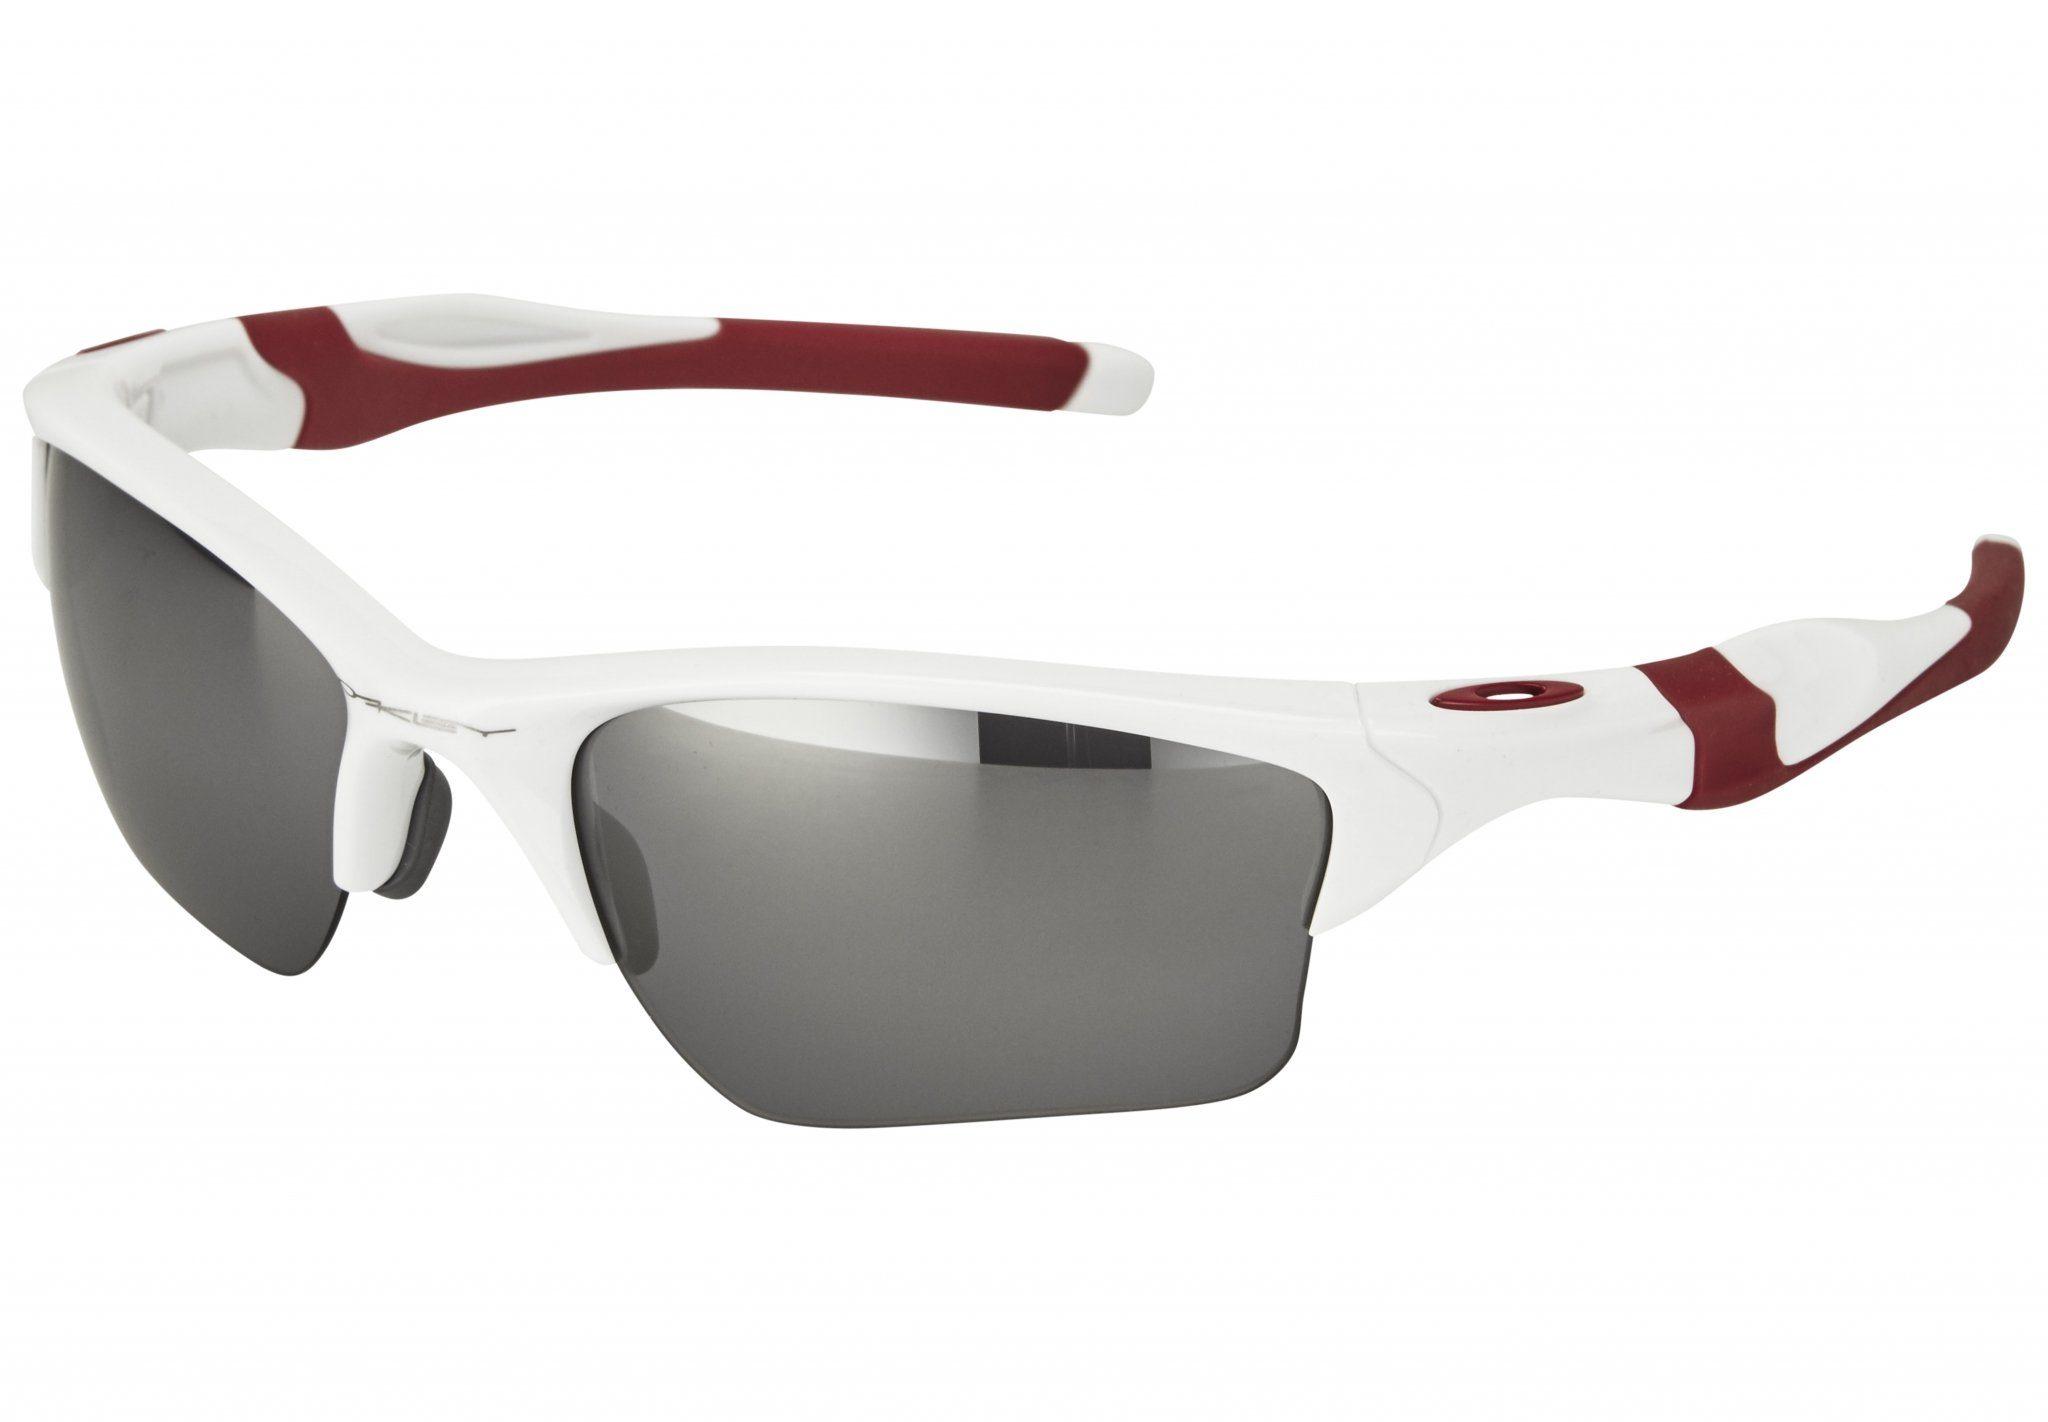 Oakley Sportbrille »Half Jacket 2.0 XL«